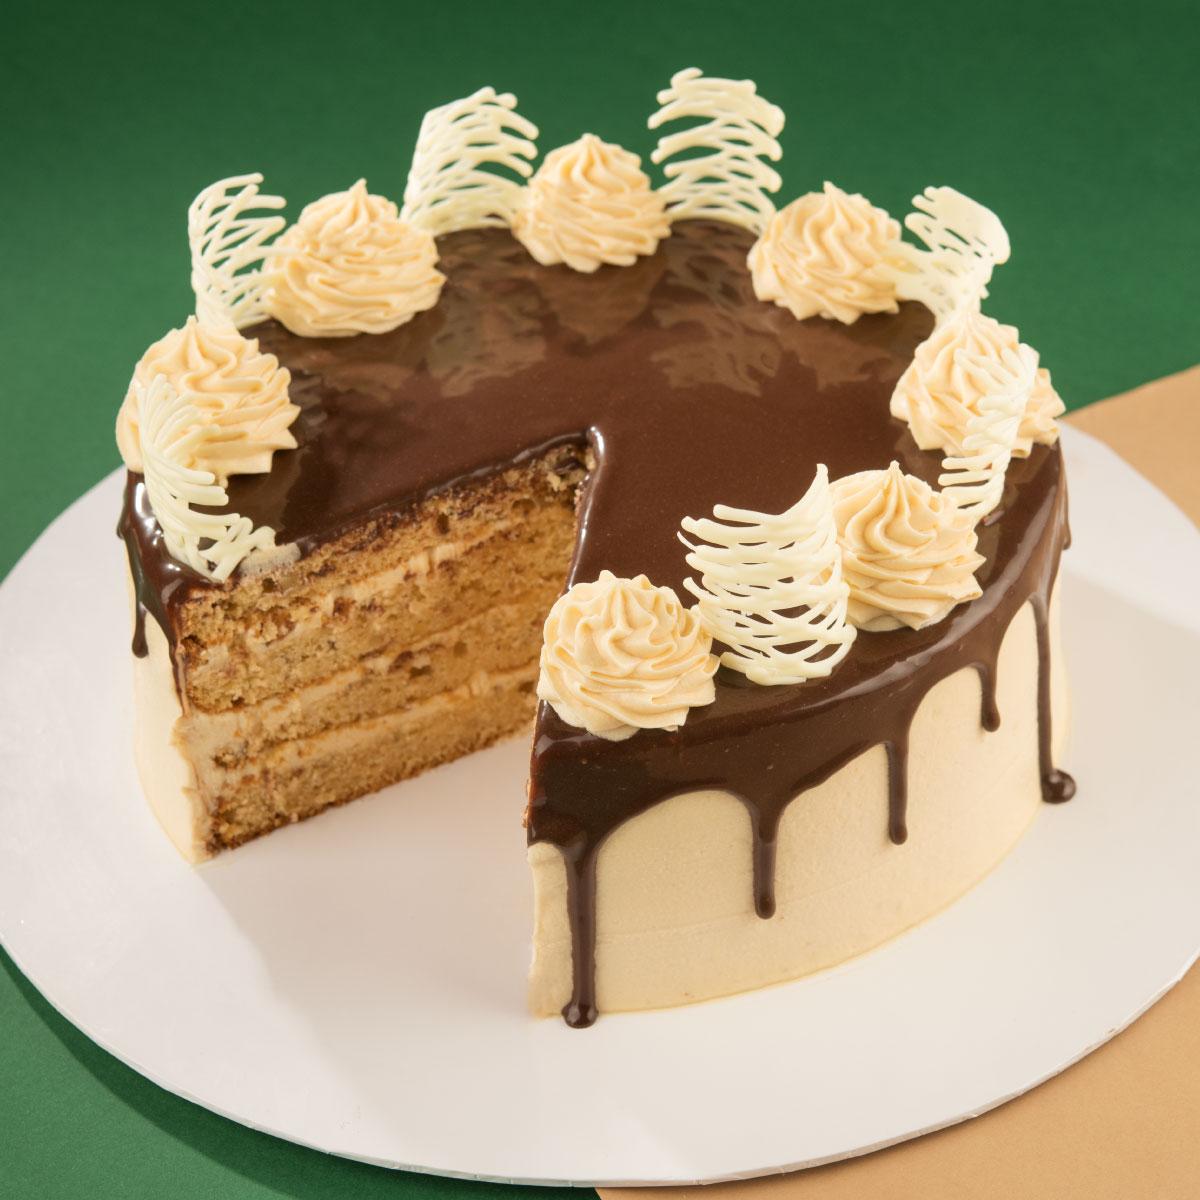 Almond Roca Caramel Cake - 1.5kg